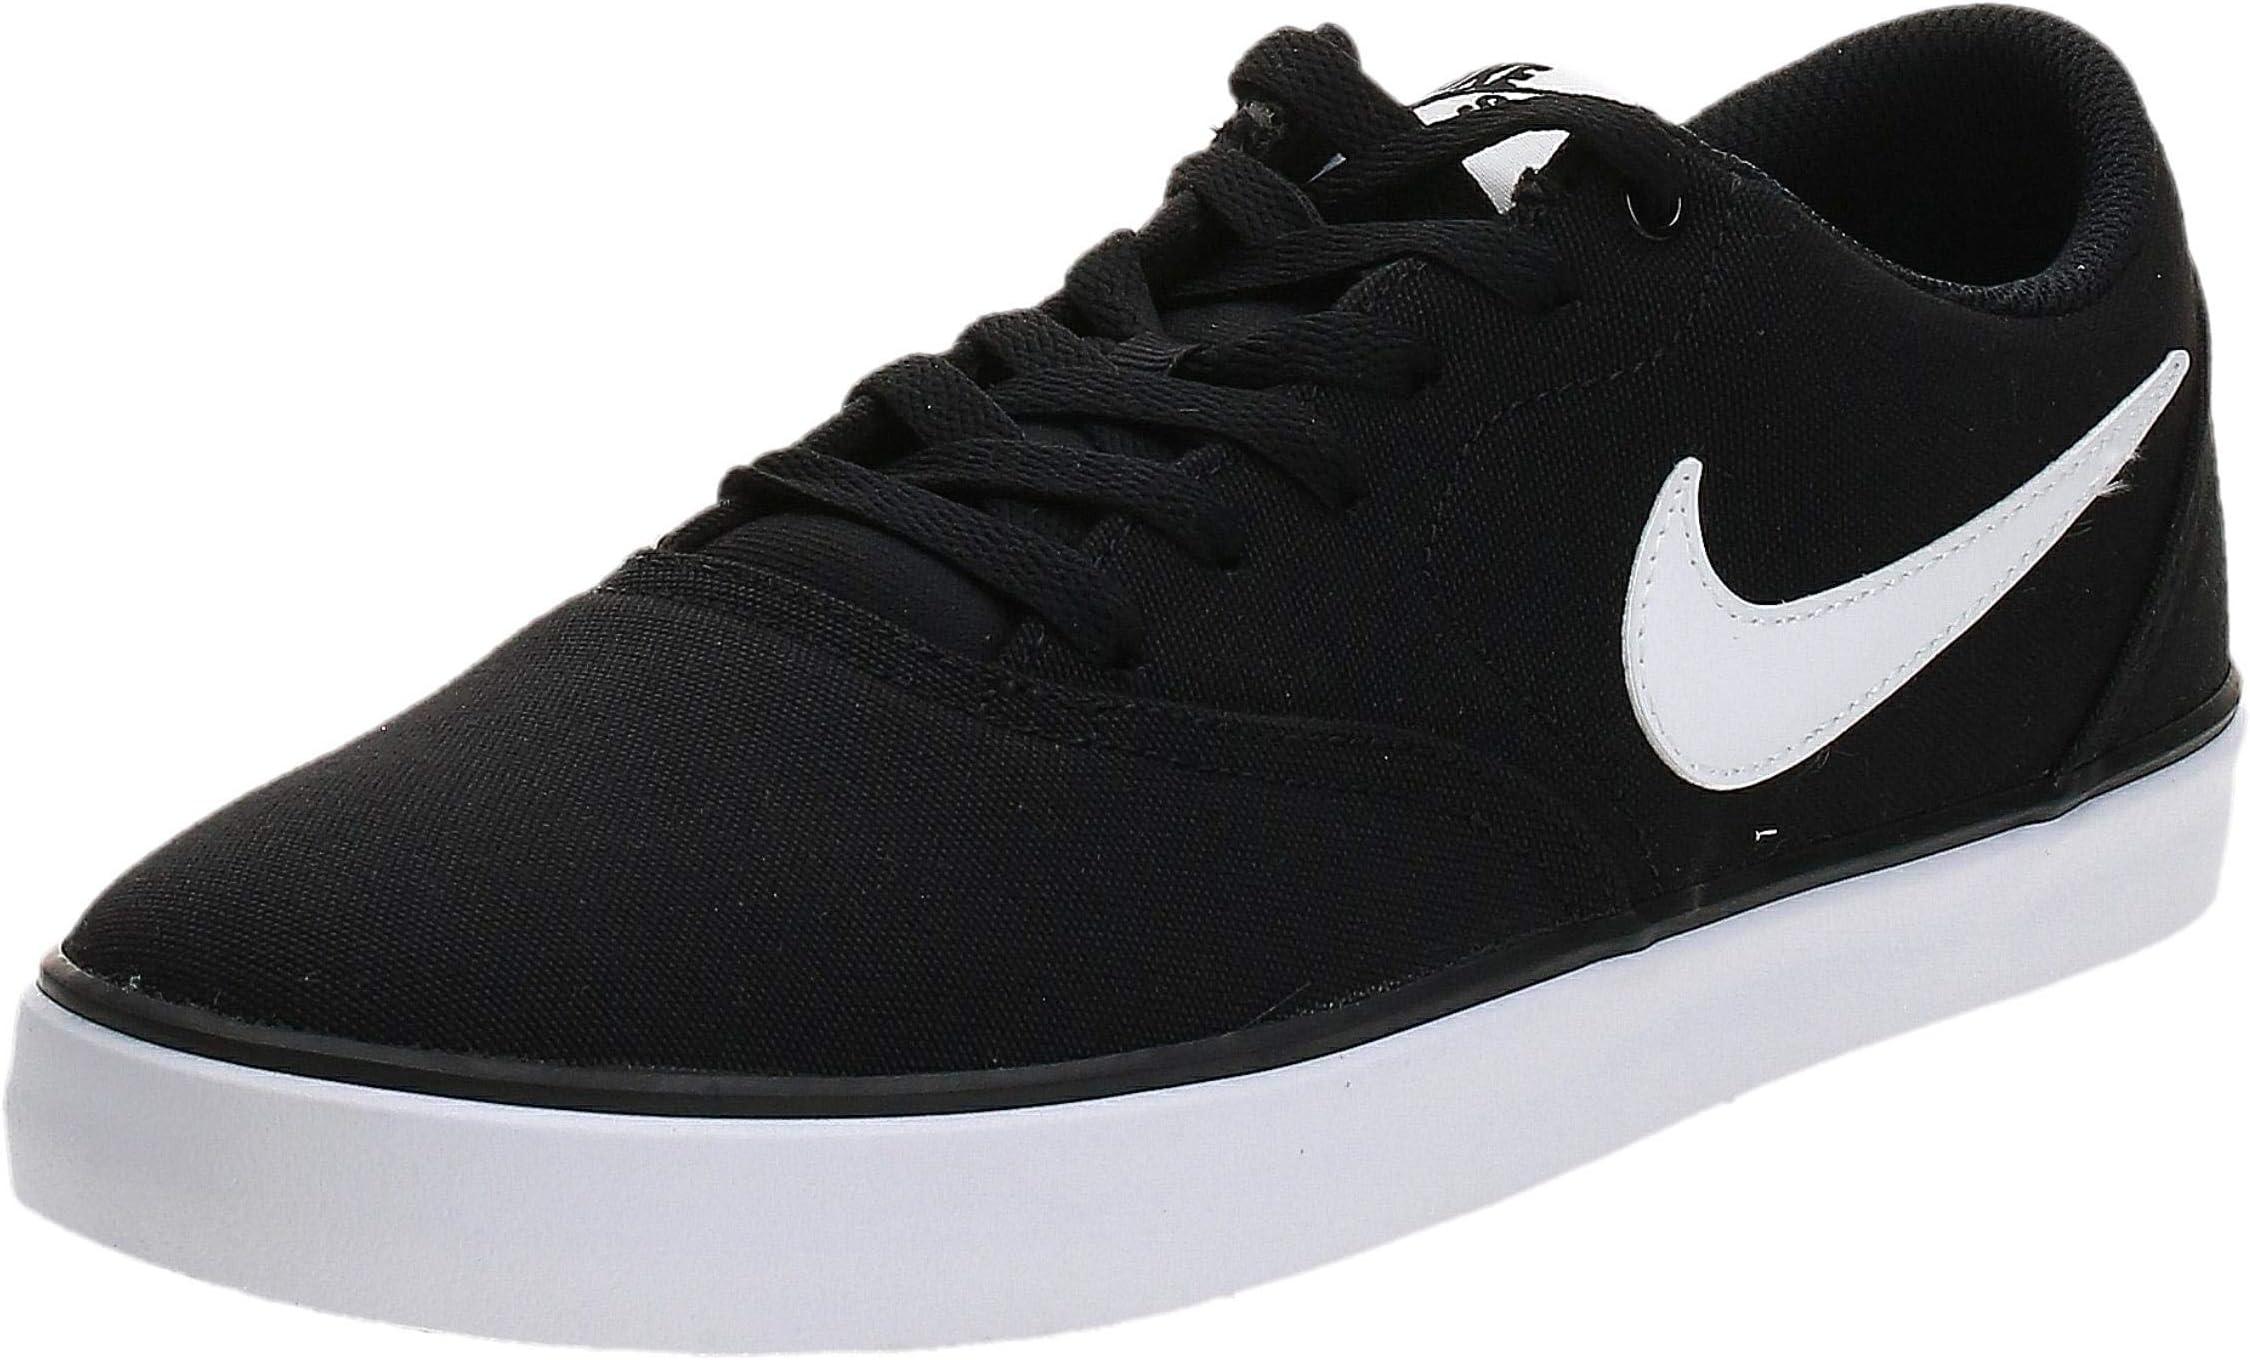 Nike Sb Check Solar Cnvs Men S Skateboarding Shoes Price In Uae Amazon Uae Kanbkam